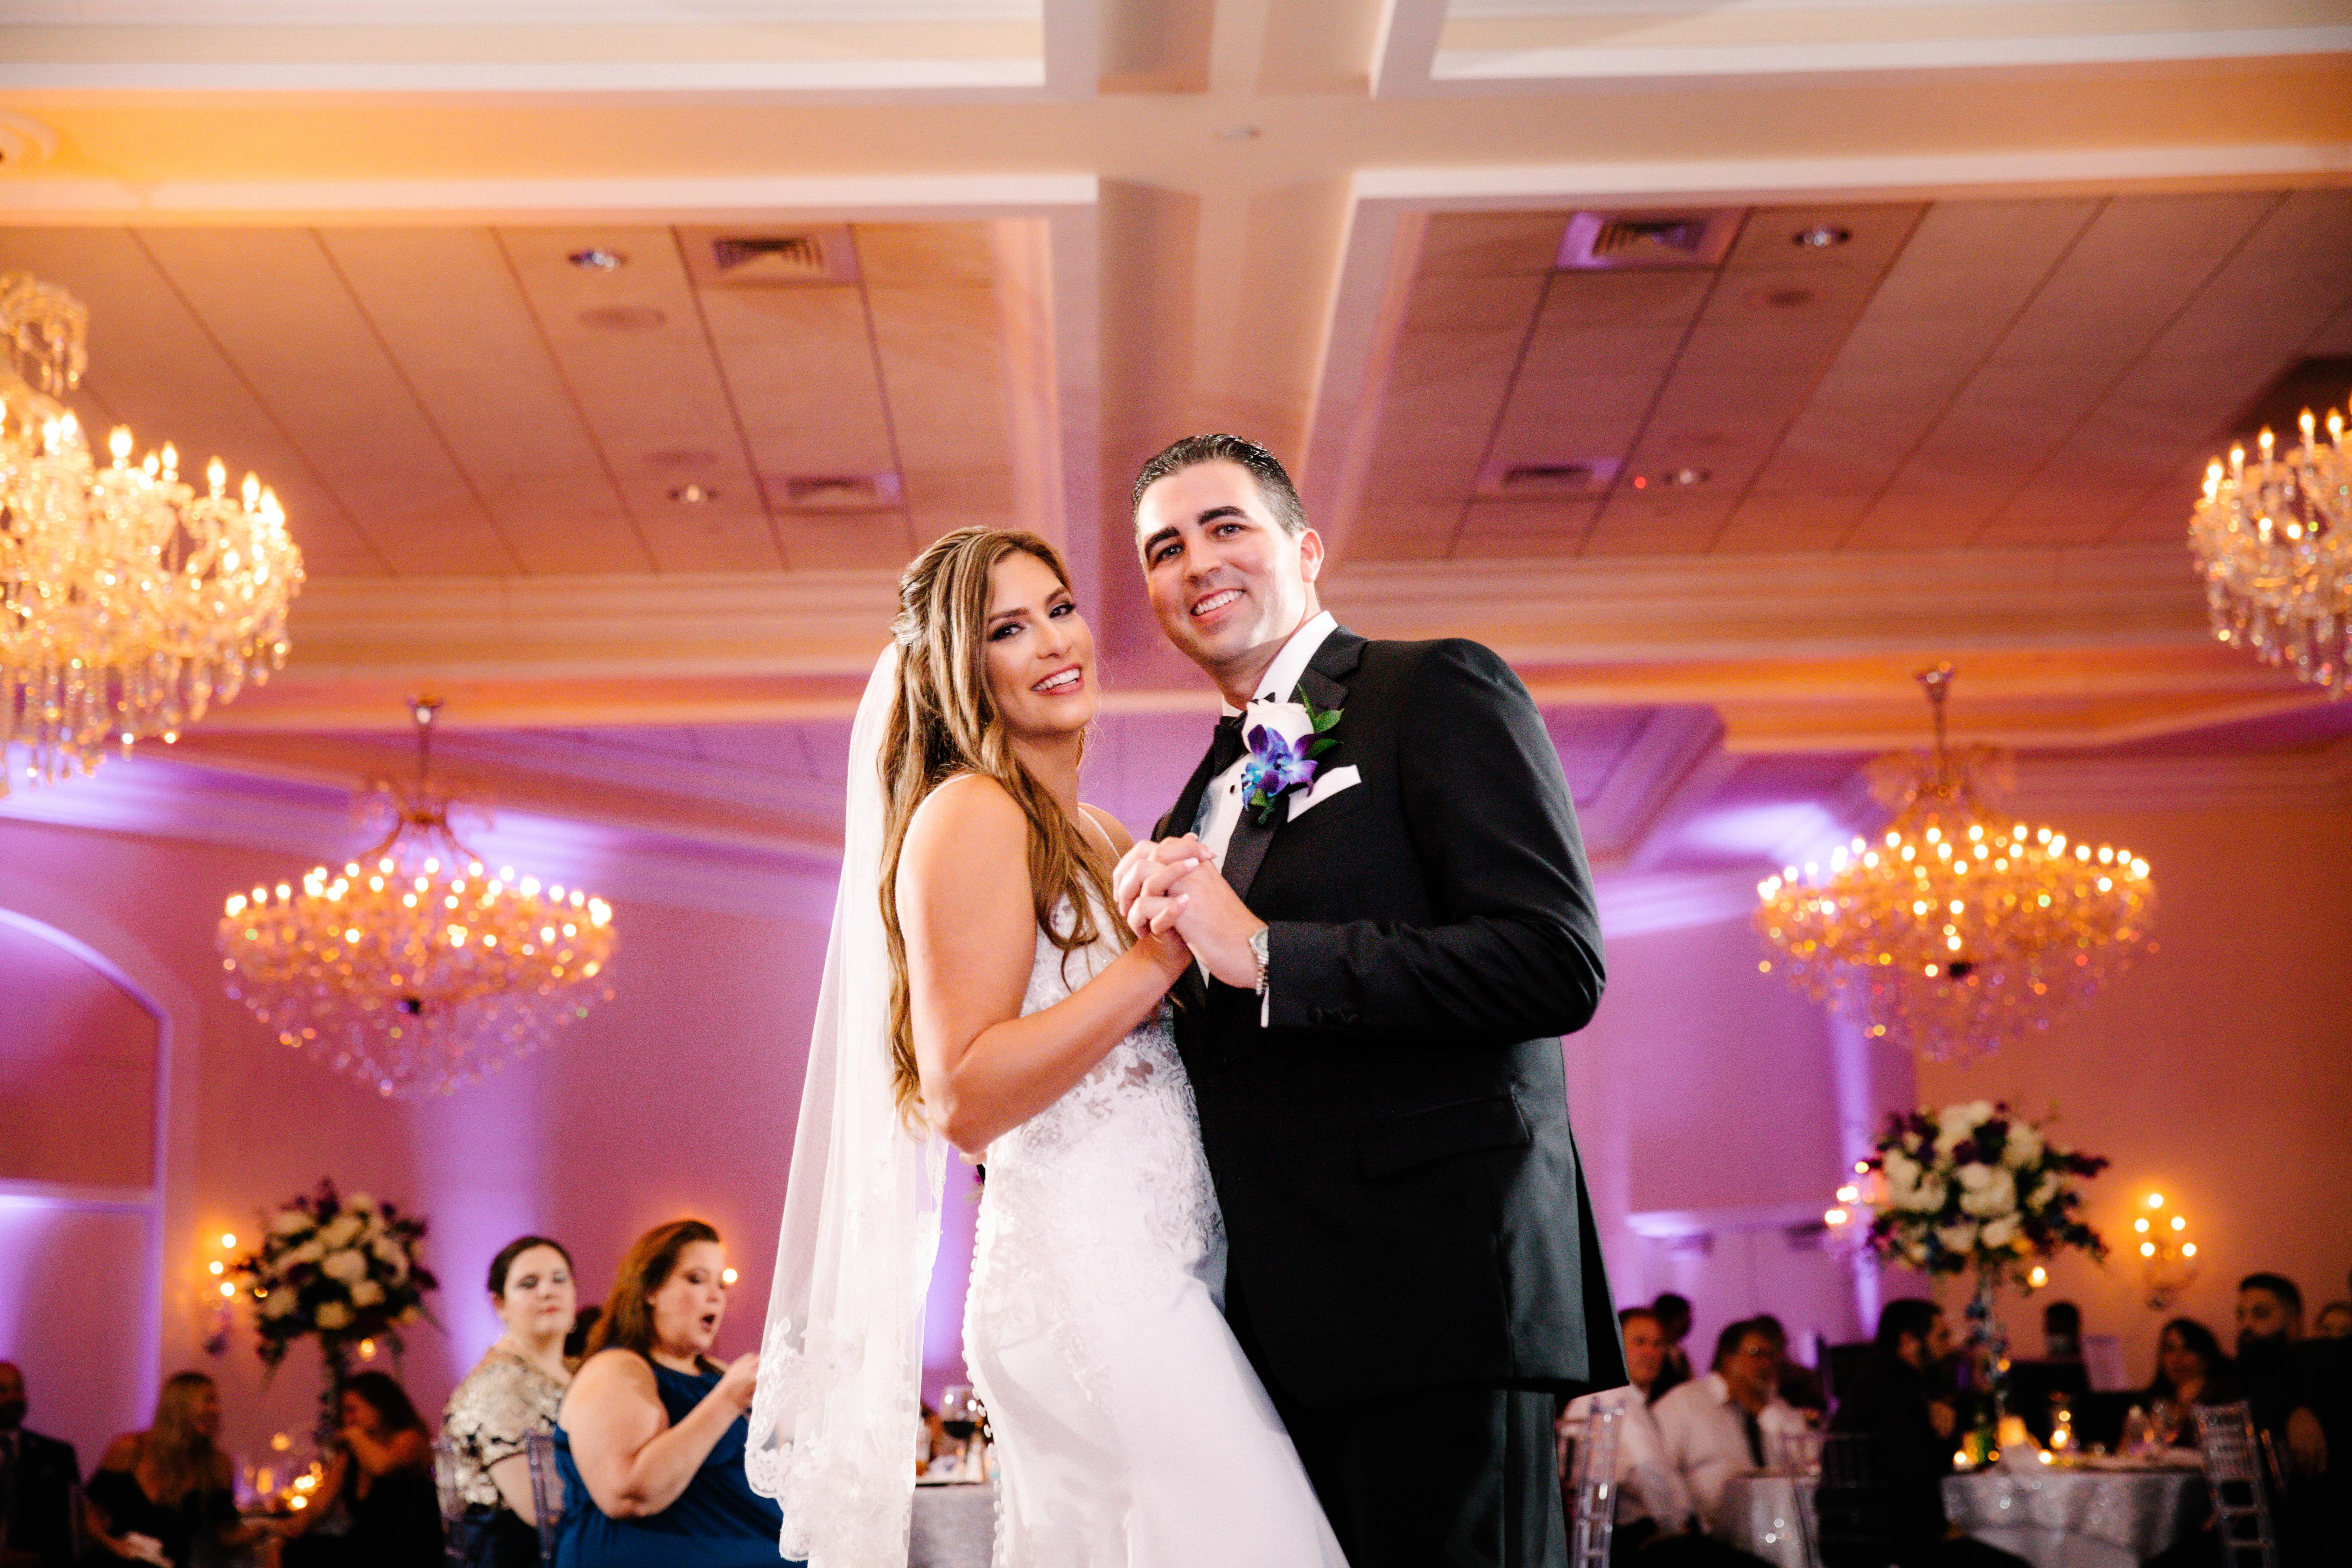 ROSINA-DIBELLO-PHOTO-DEERCREEK-WEDDING-7